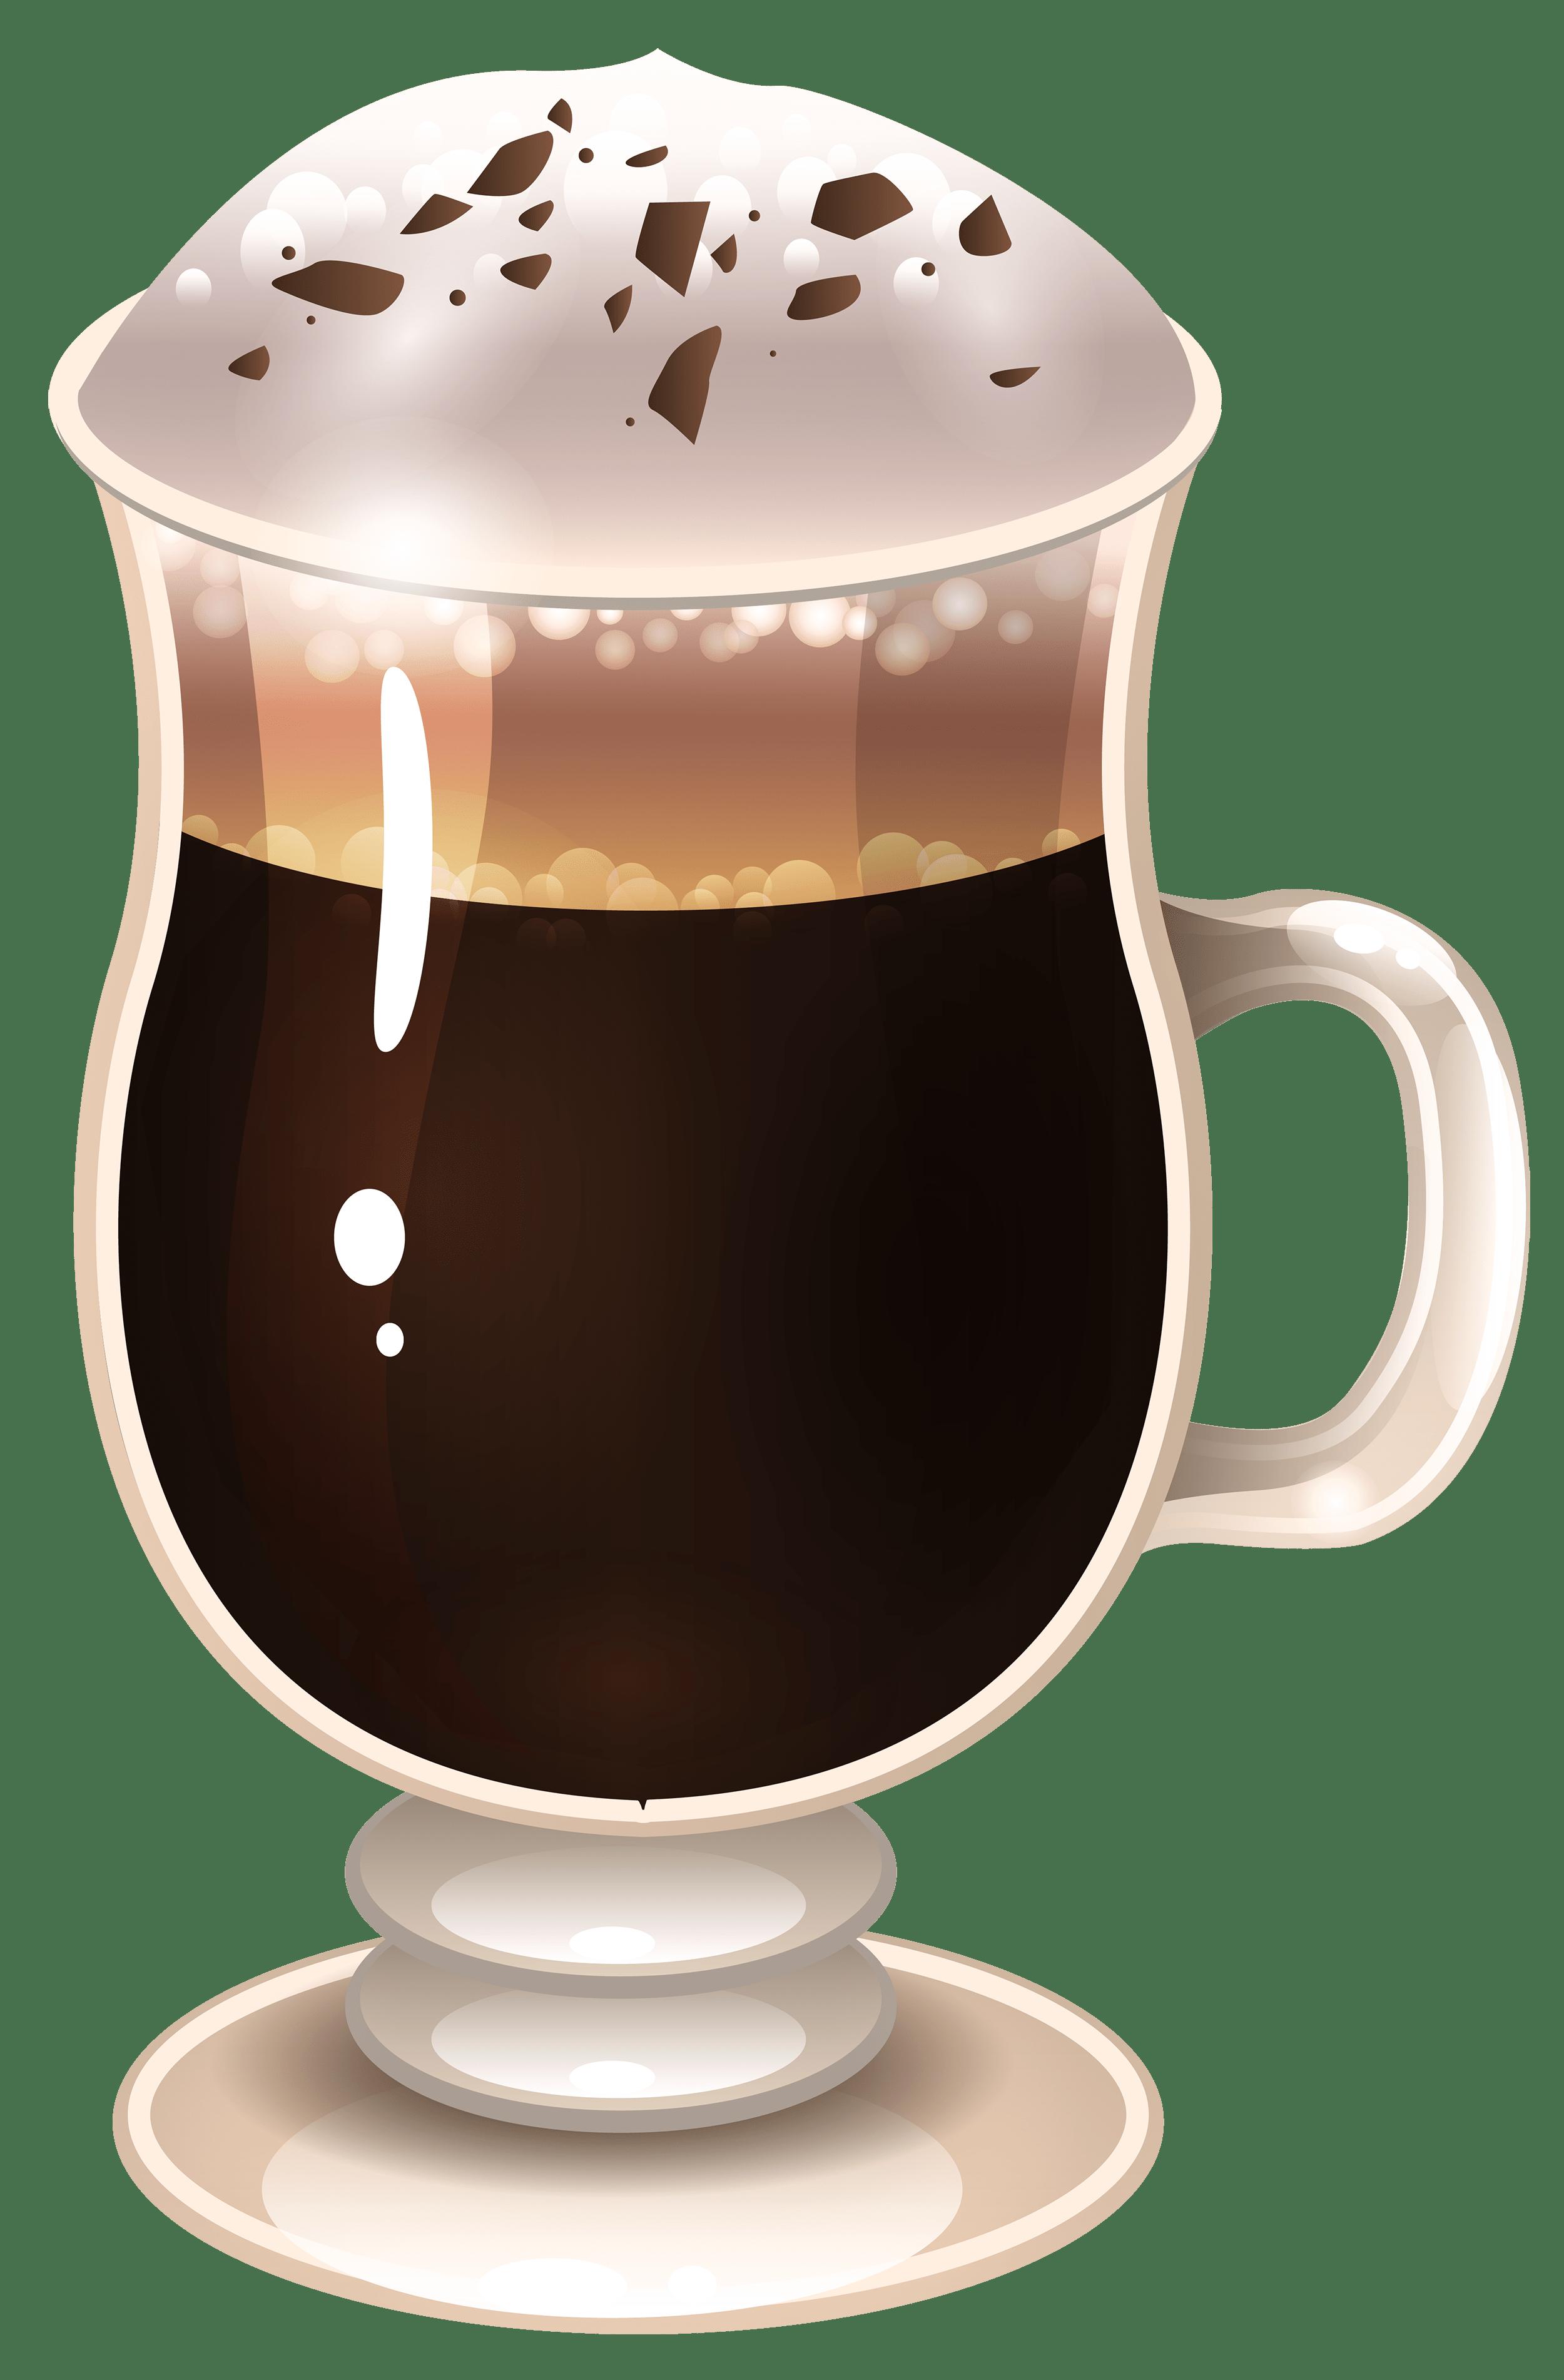 Cute Coffee Mug Wallpaper Cafe Latte Clipart Clipground